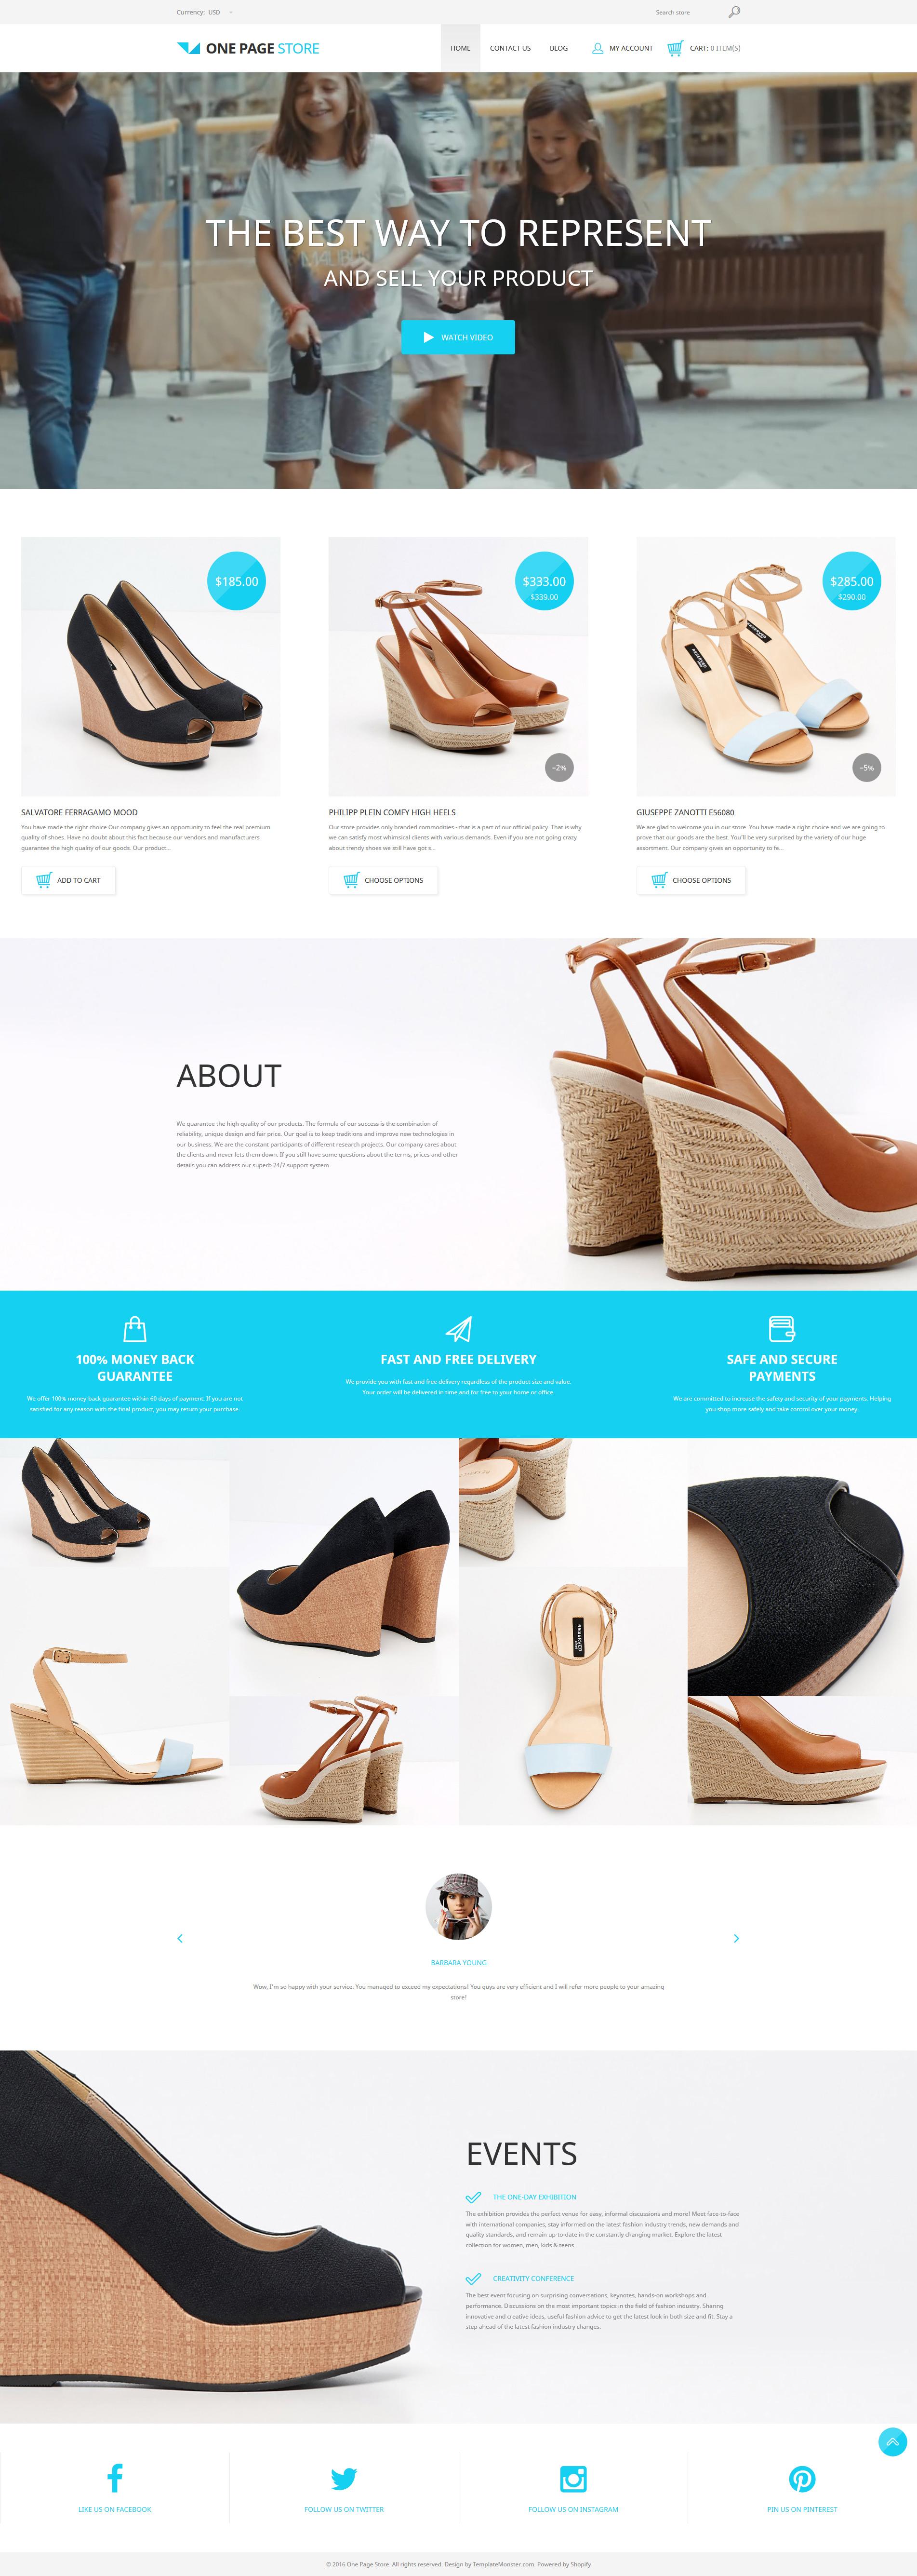 Адаптивный Shopify шаблон №58373 на тему магазин обуви